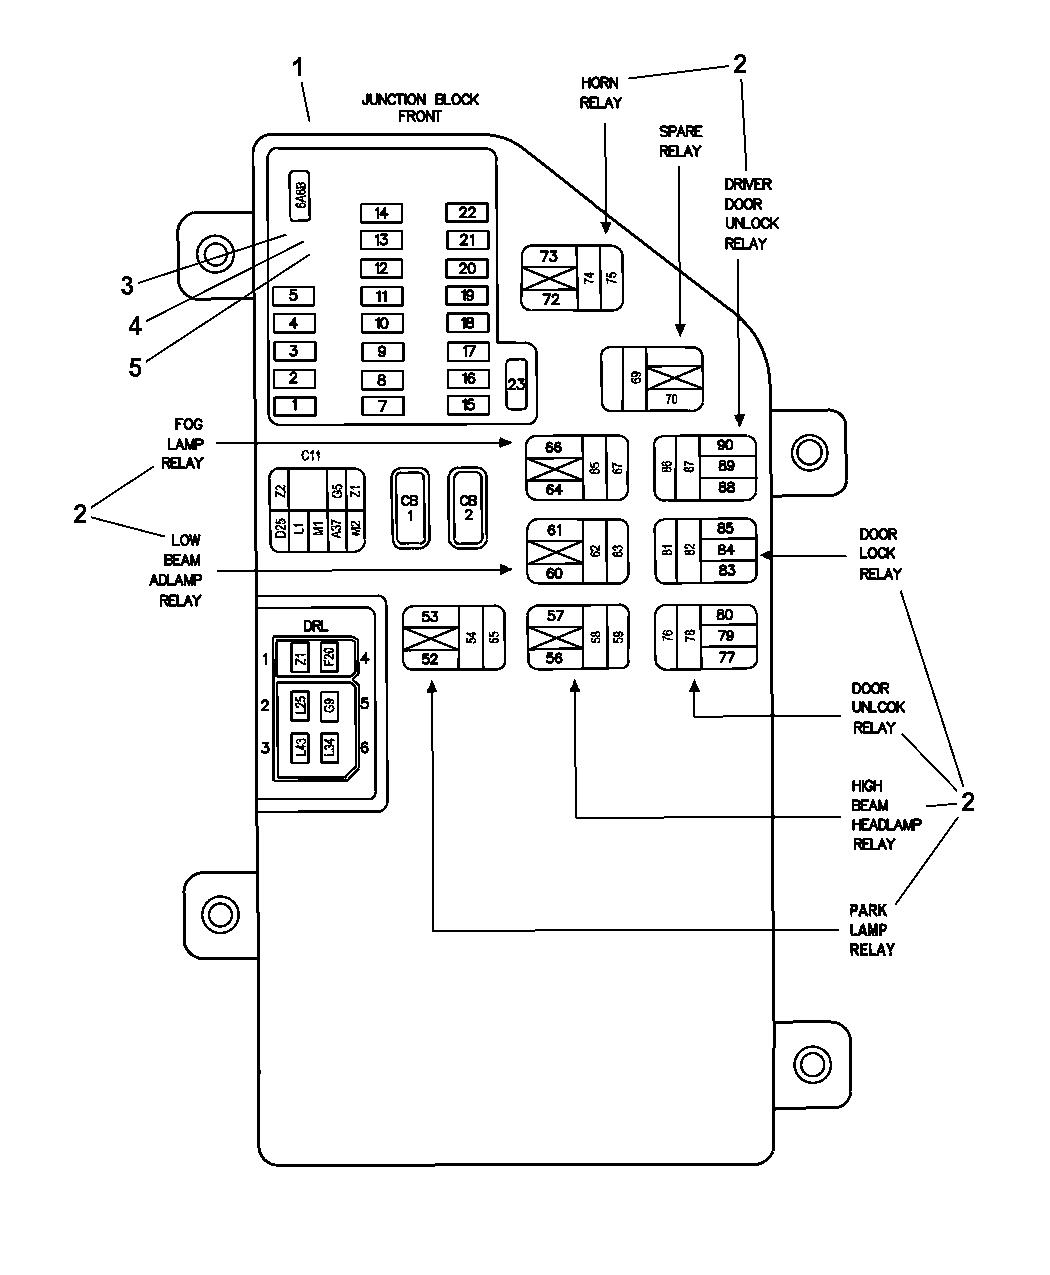 wiring diagram for 2004 dodge intrepid 2004 dodge intrepid junction block relays and fuses  2004 dodge intrepid junction block